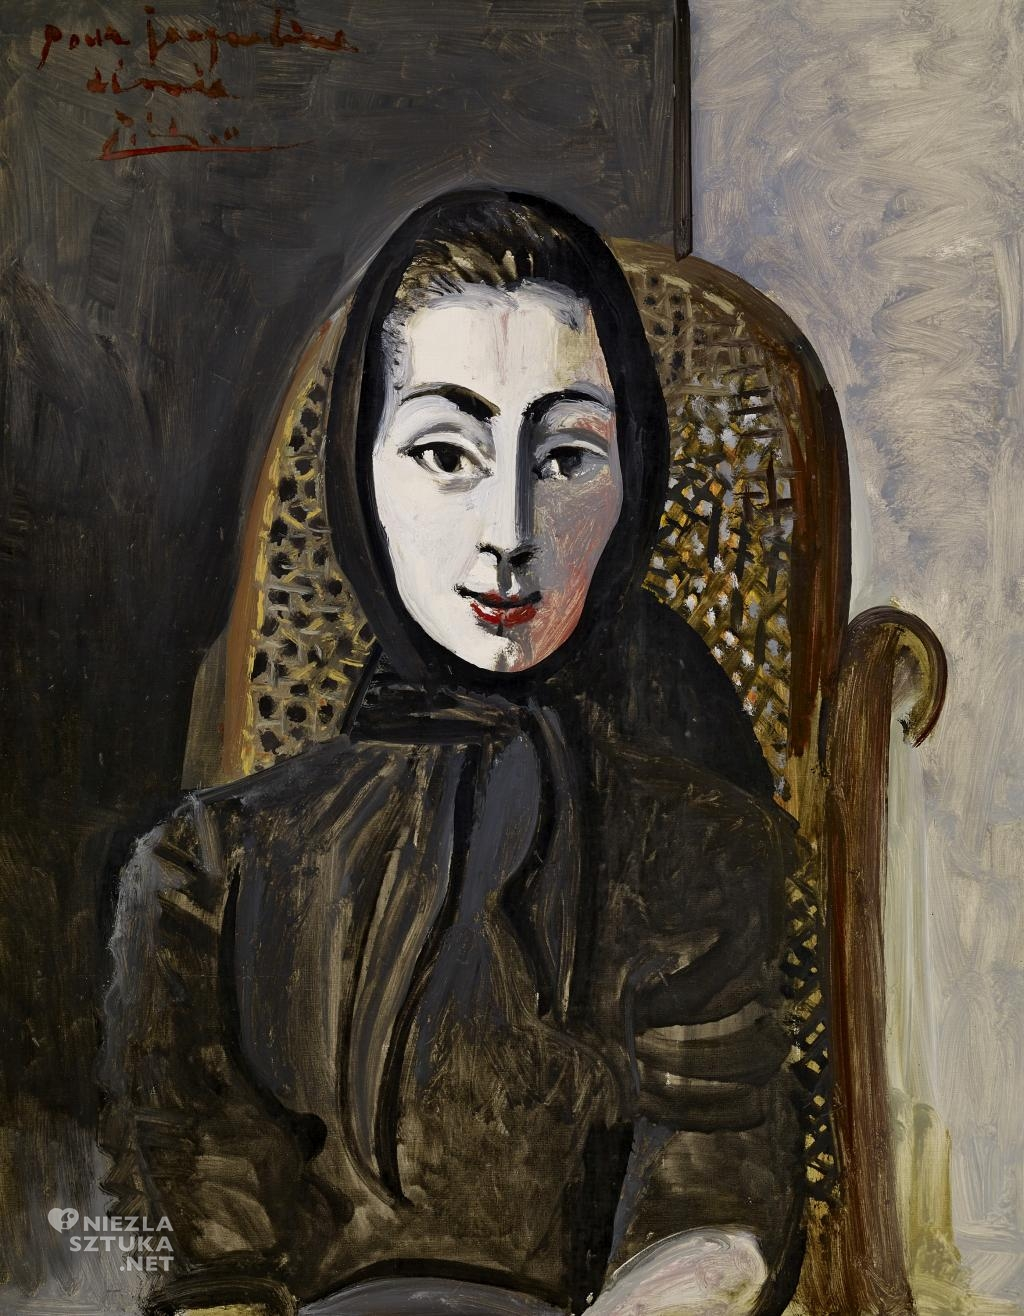 Pablo Picasso, Portret Jacqueline Roque, kobiety Picassa, Niezła Sztuka